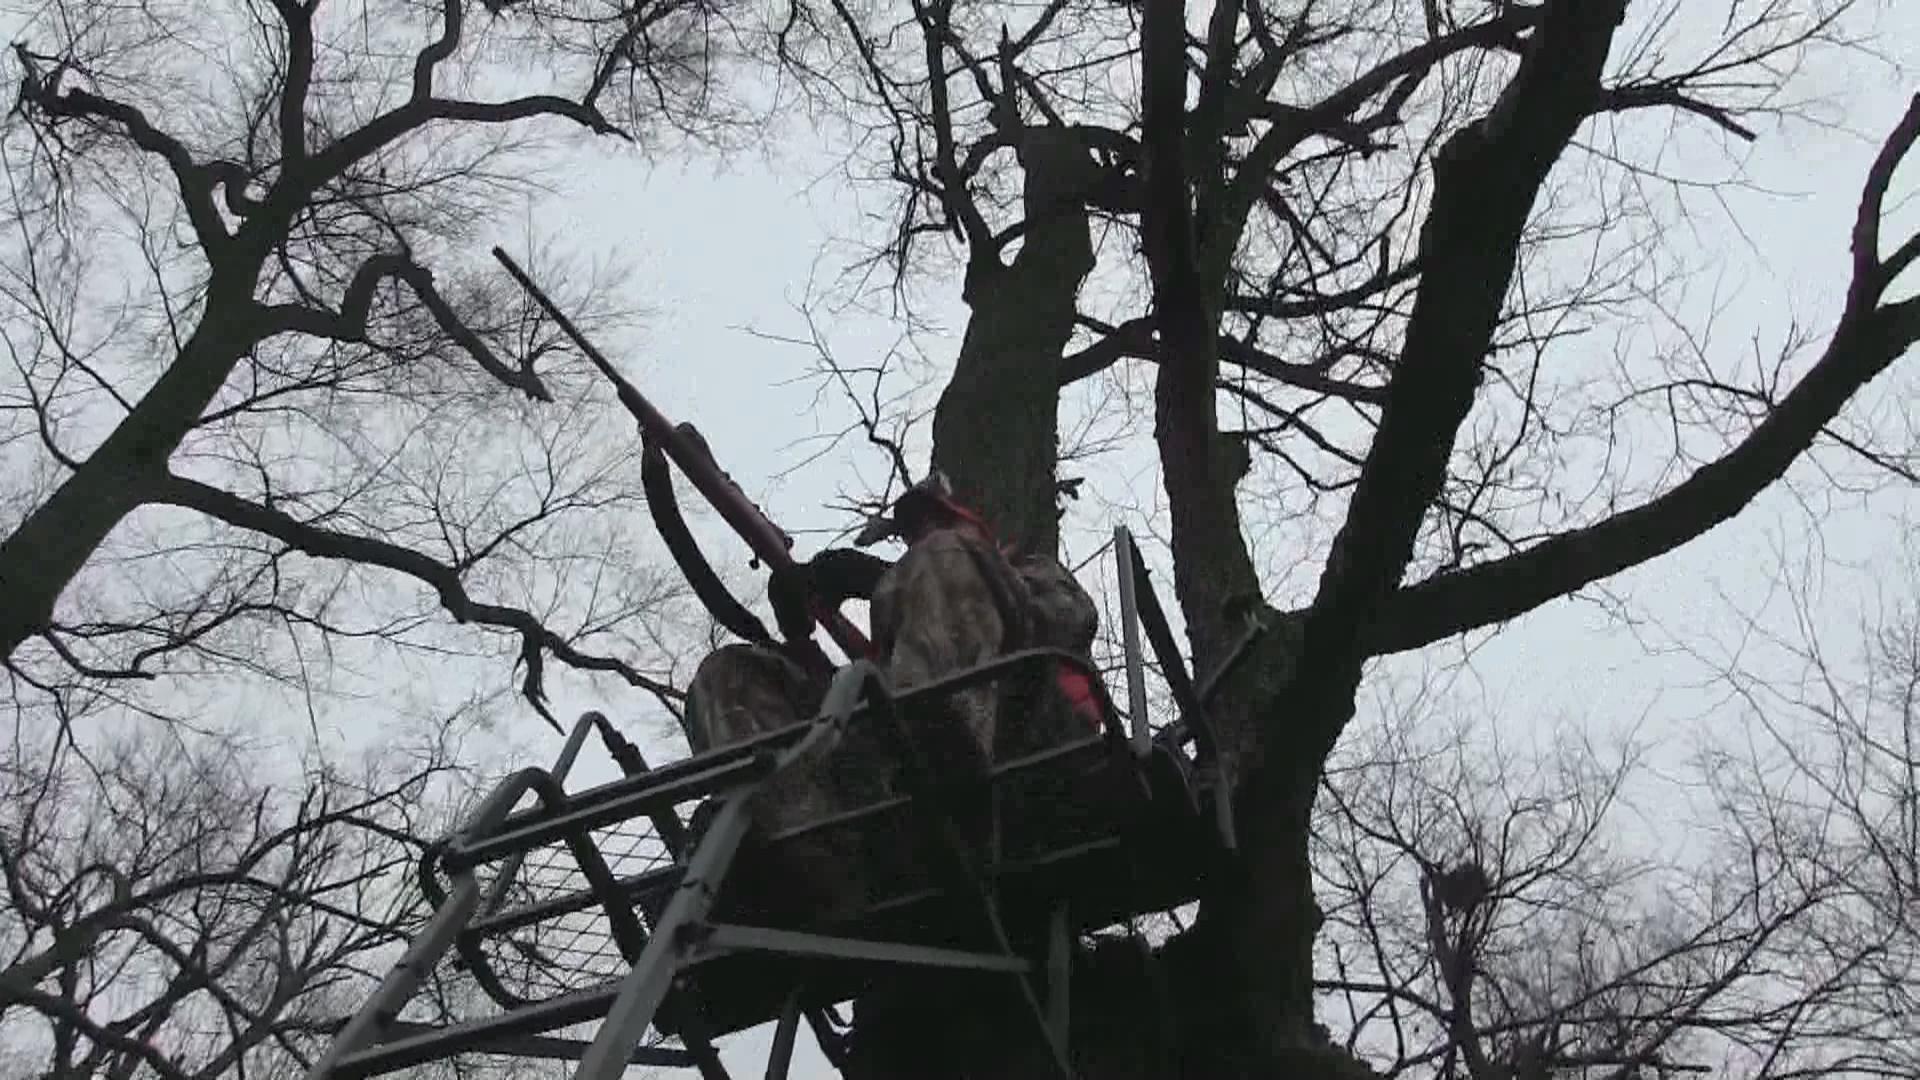 treestand_1538171136301.jpg